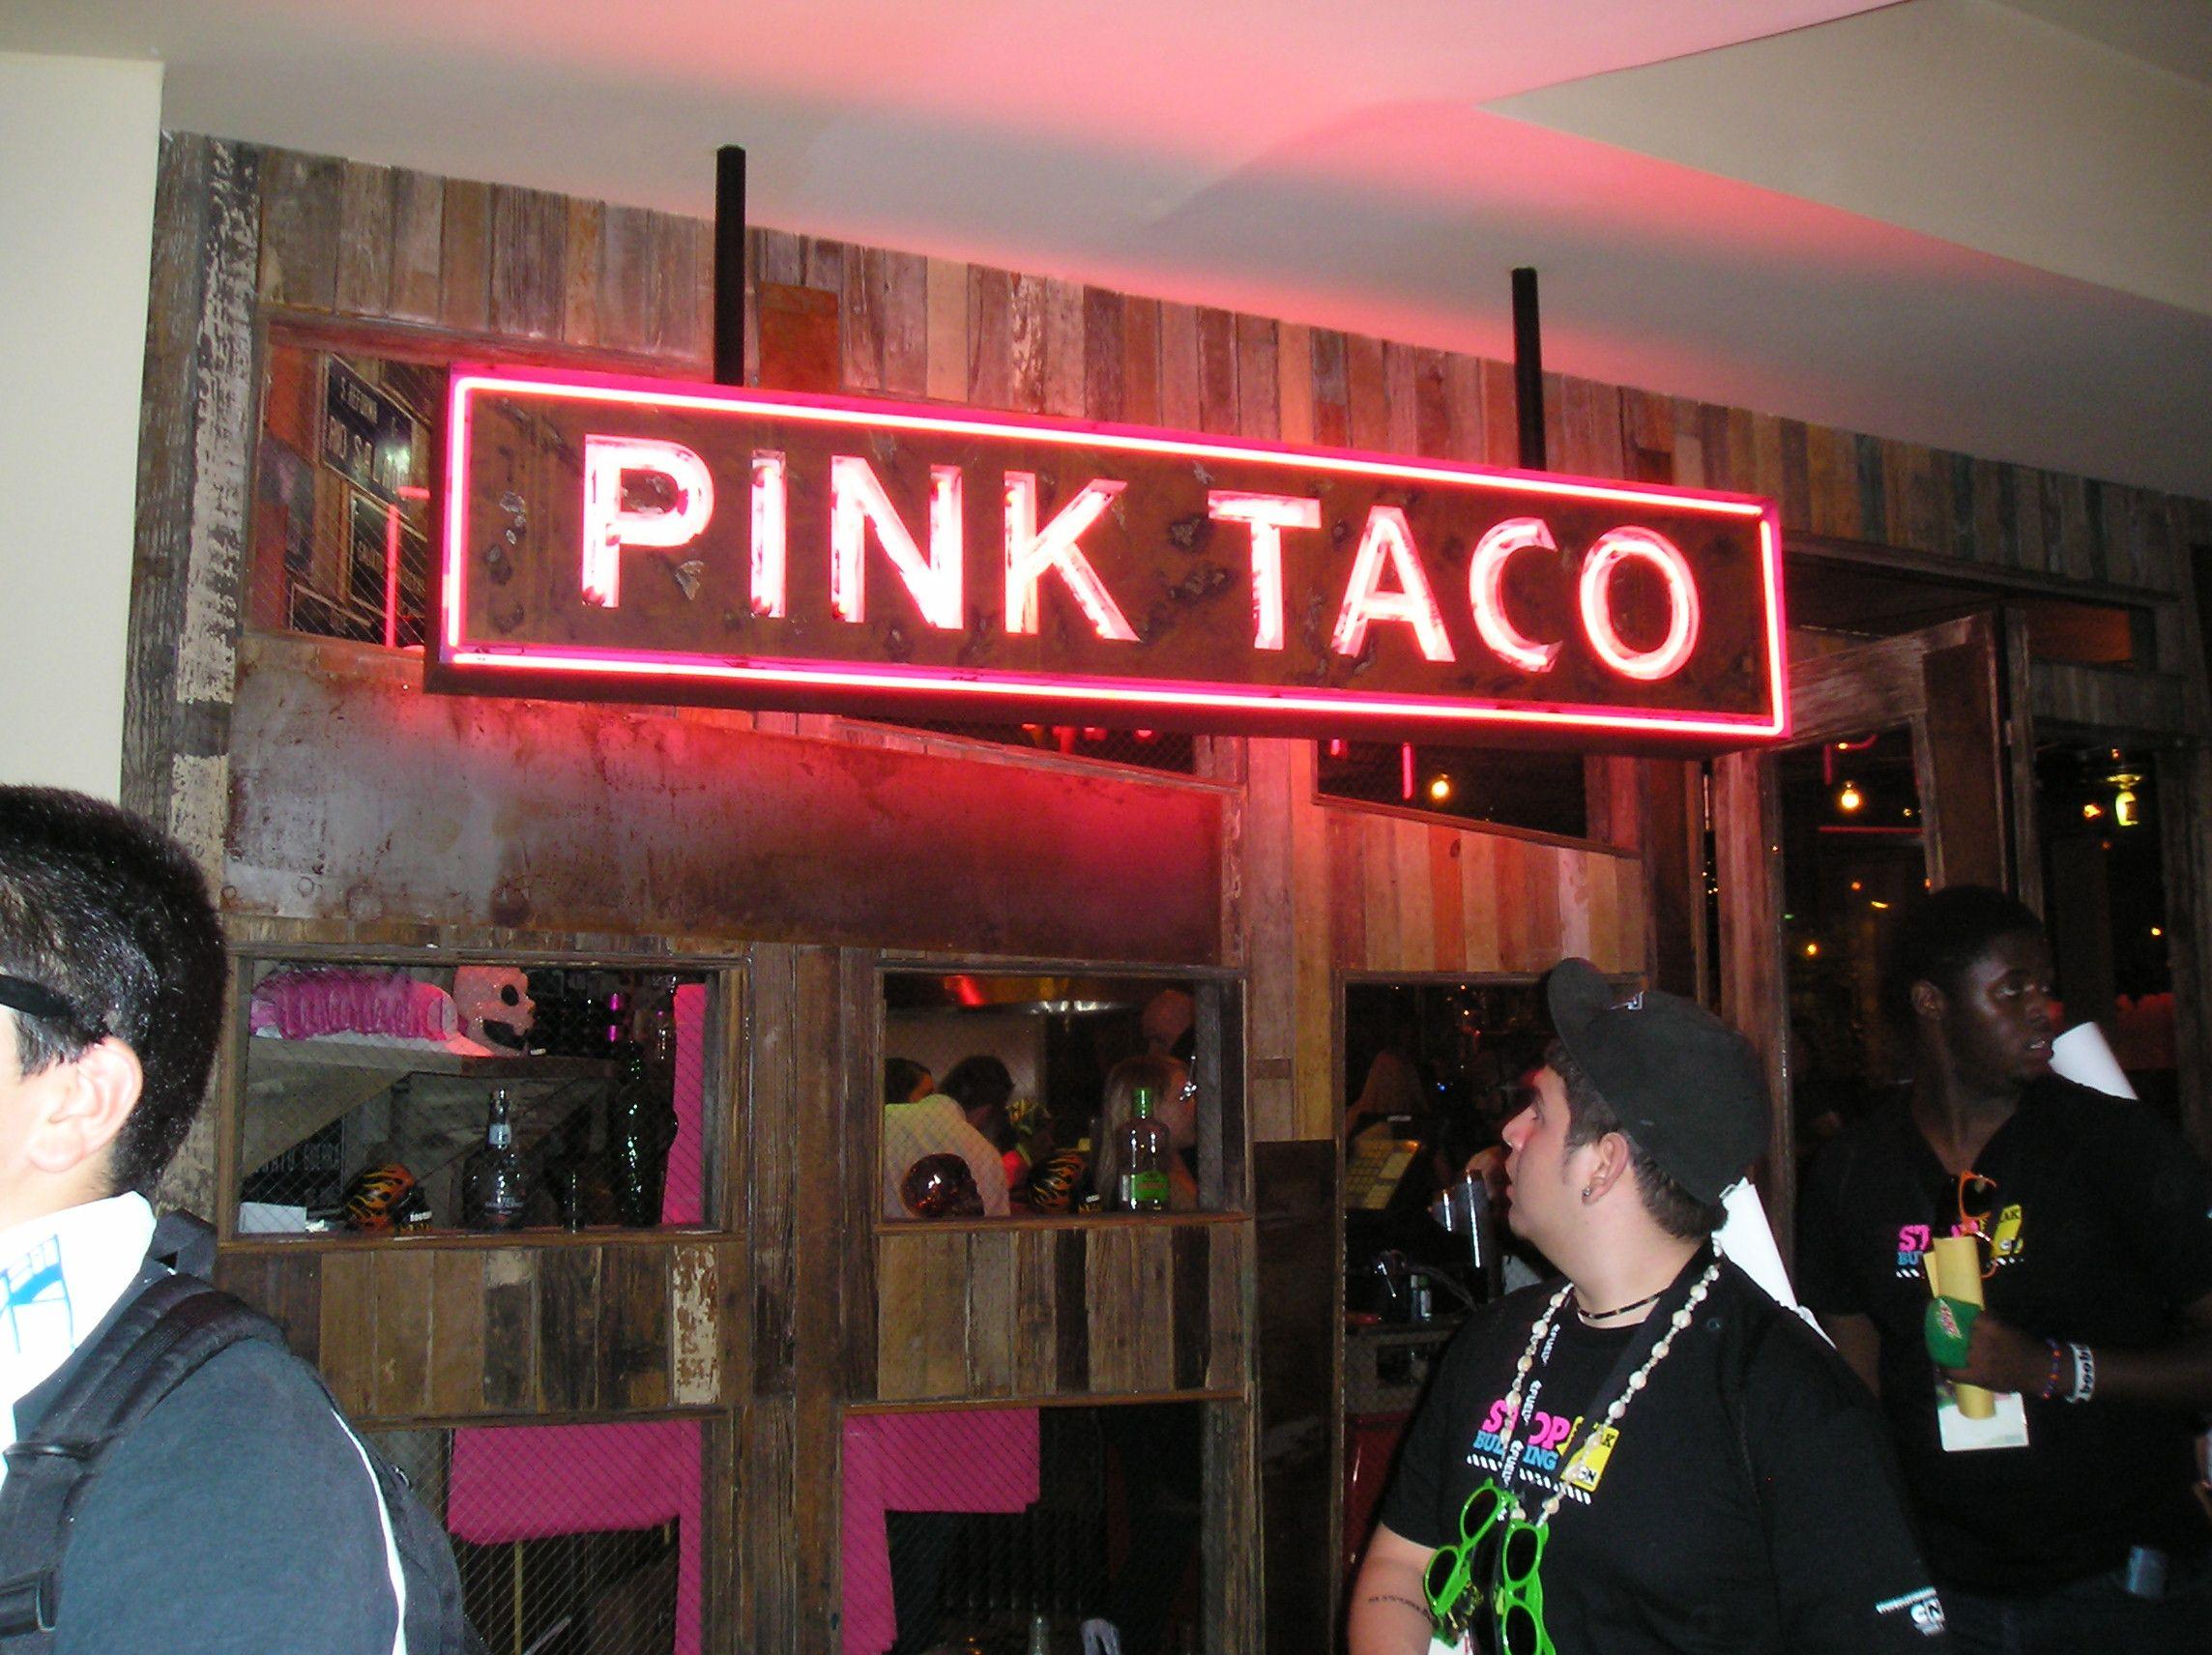 Pink Taco Restaurant Las Vegas NV Great Food!!! Las